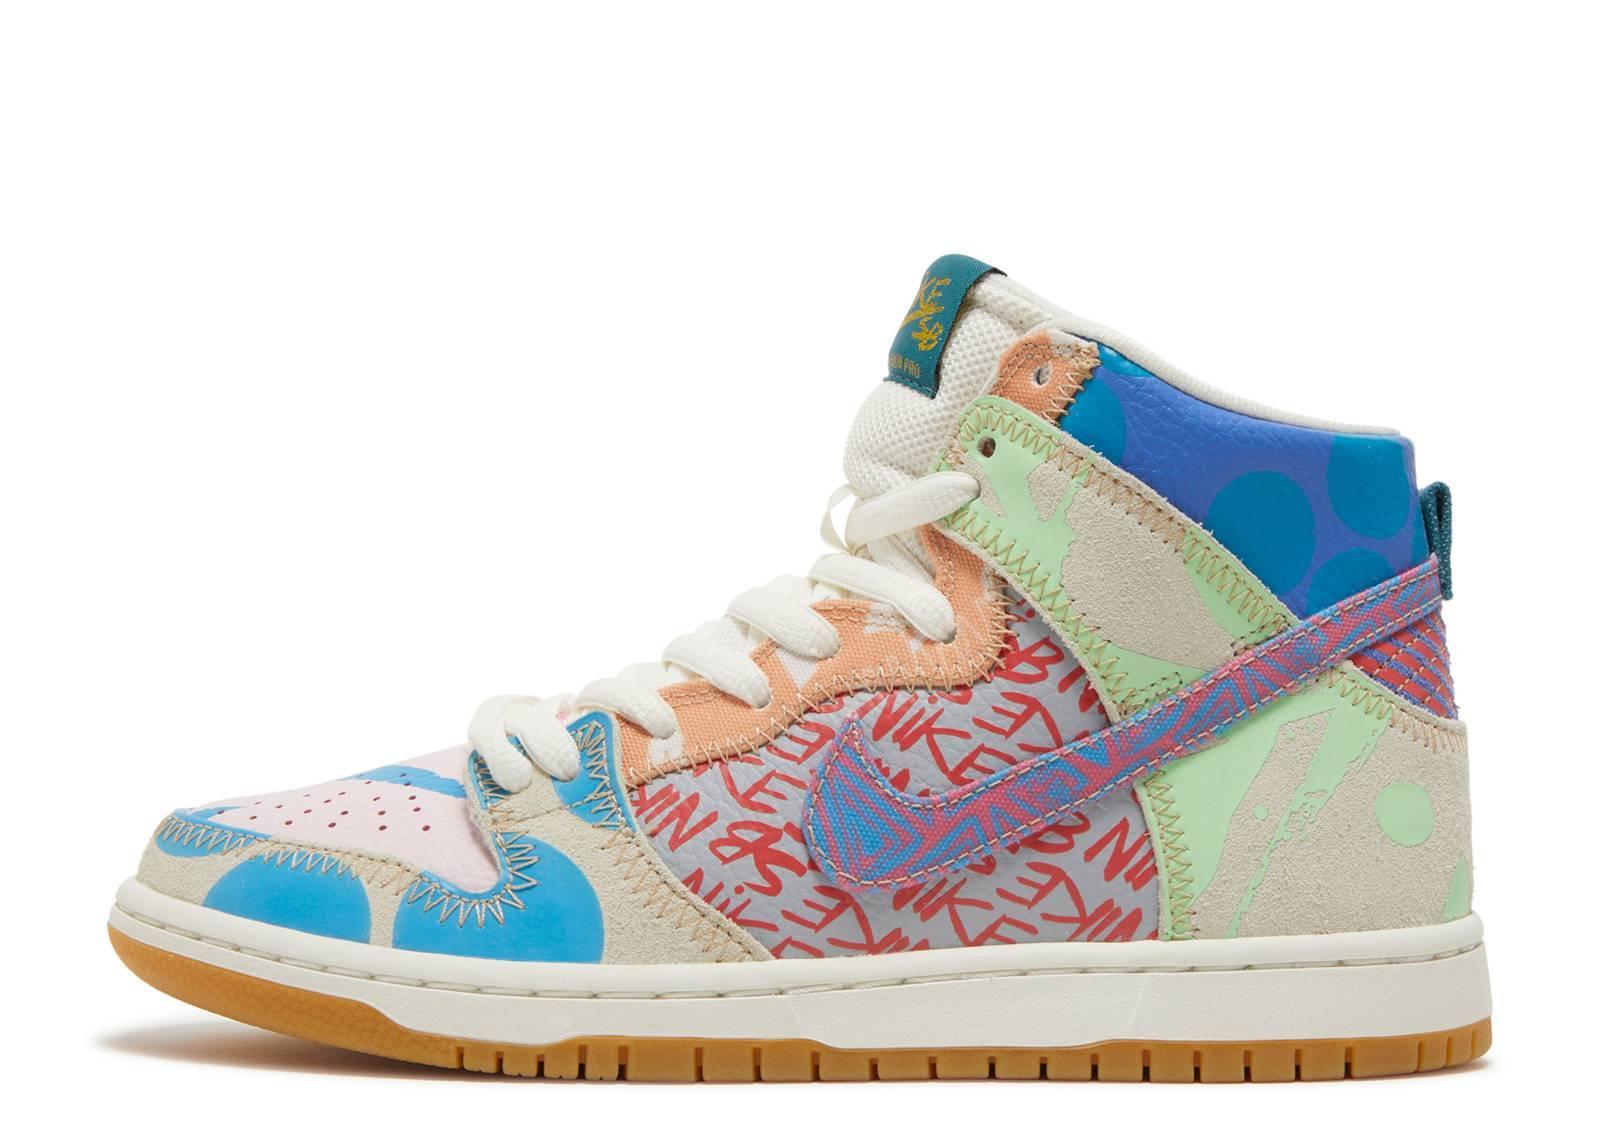 48c0248850a0 Nike Sb Zoom Dunk High Prem